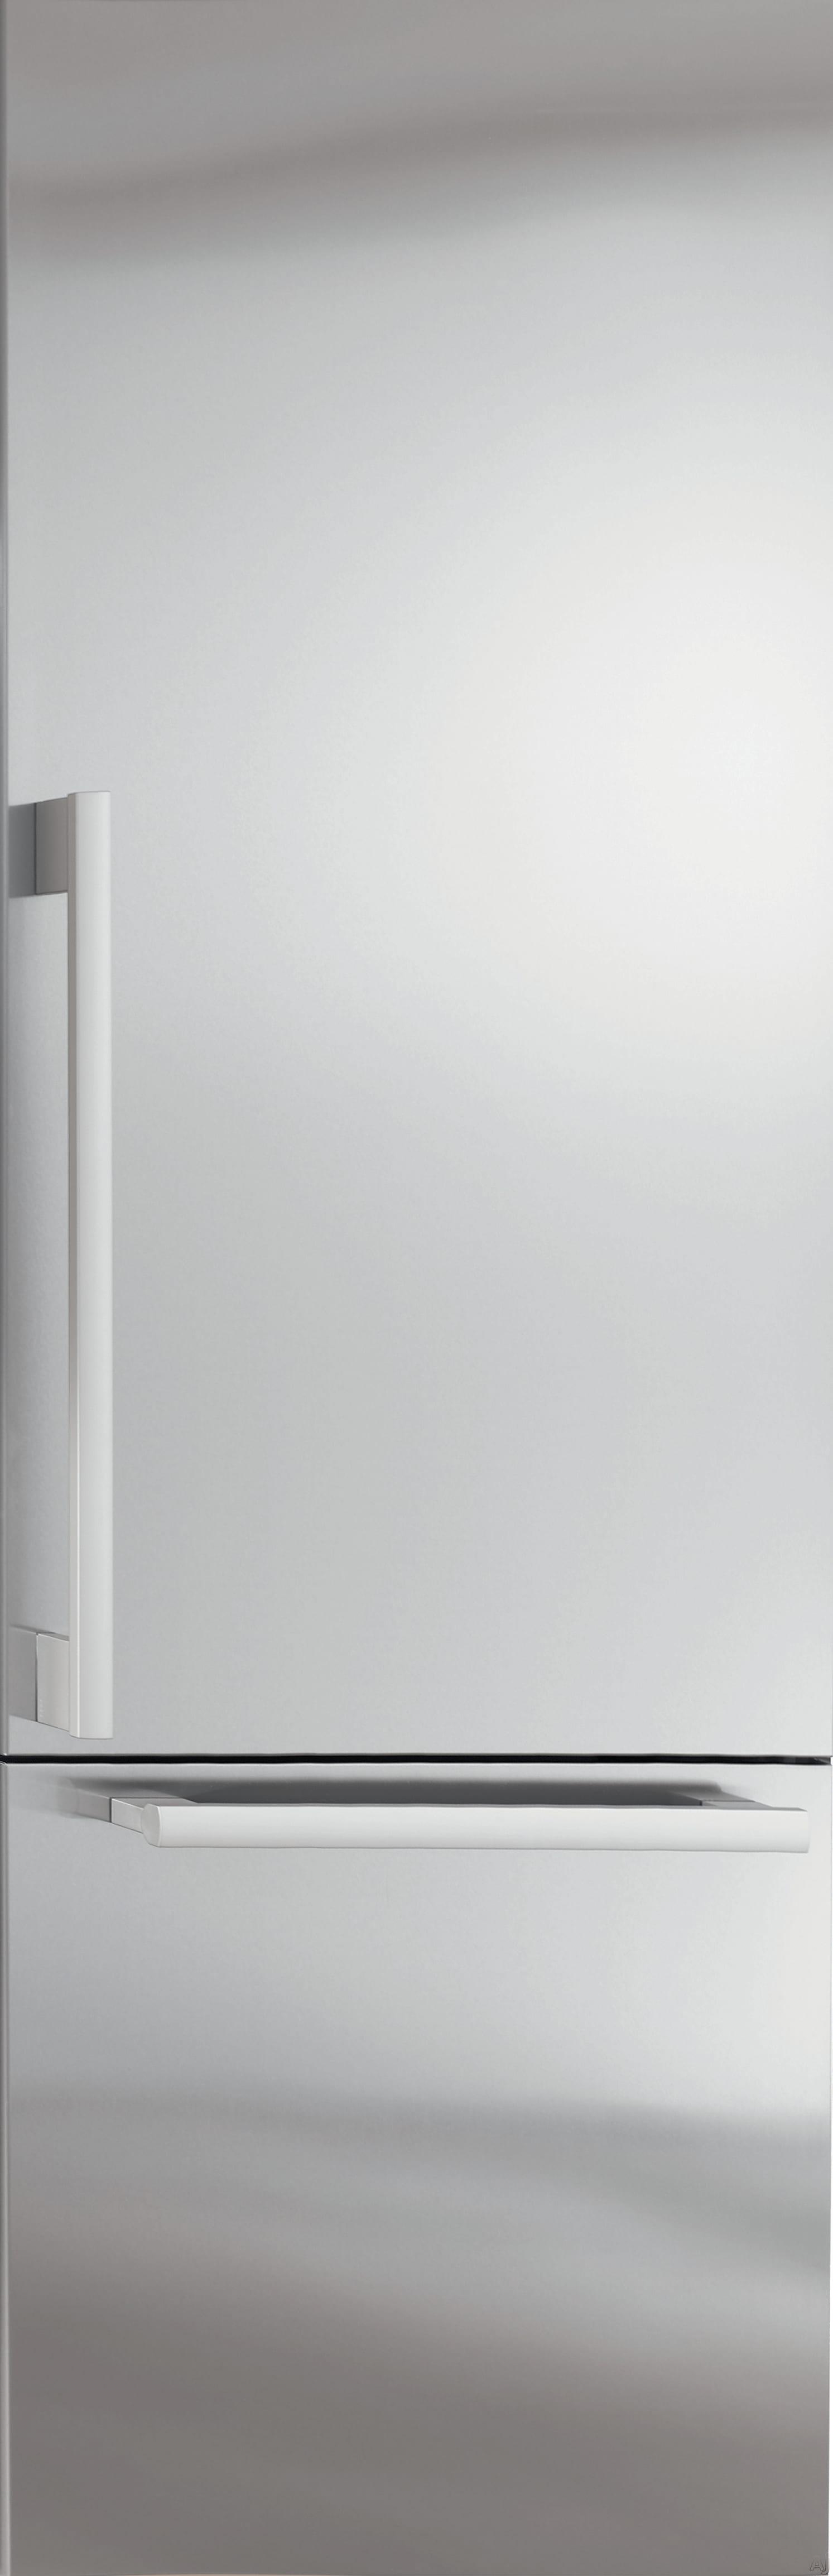 Miele Kf1913sf 36 Inch Built In Bottom Freezer